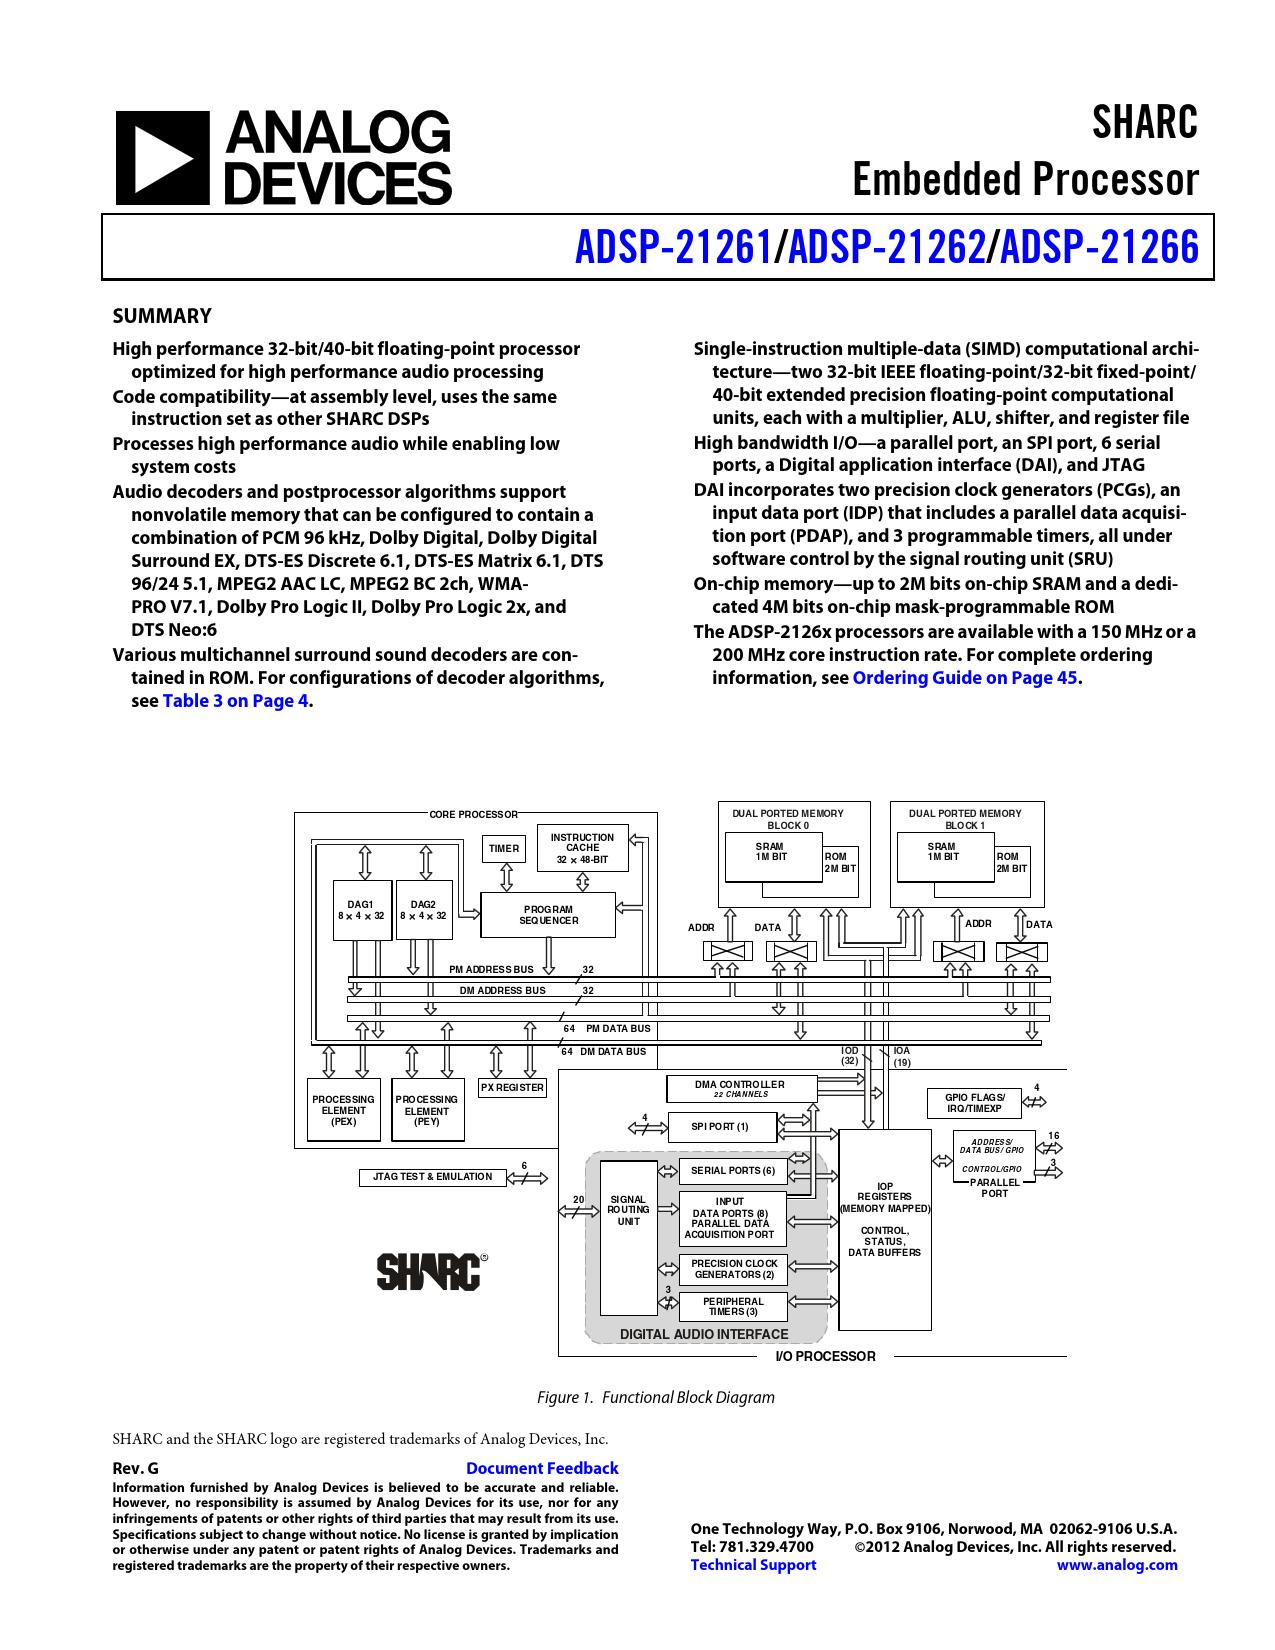 Datasheet ADSP-21261, ADSP-21262, ADSP-21266 Analog Devices, Версия: G